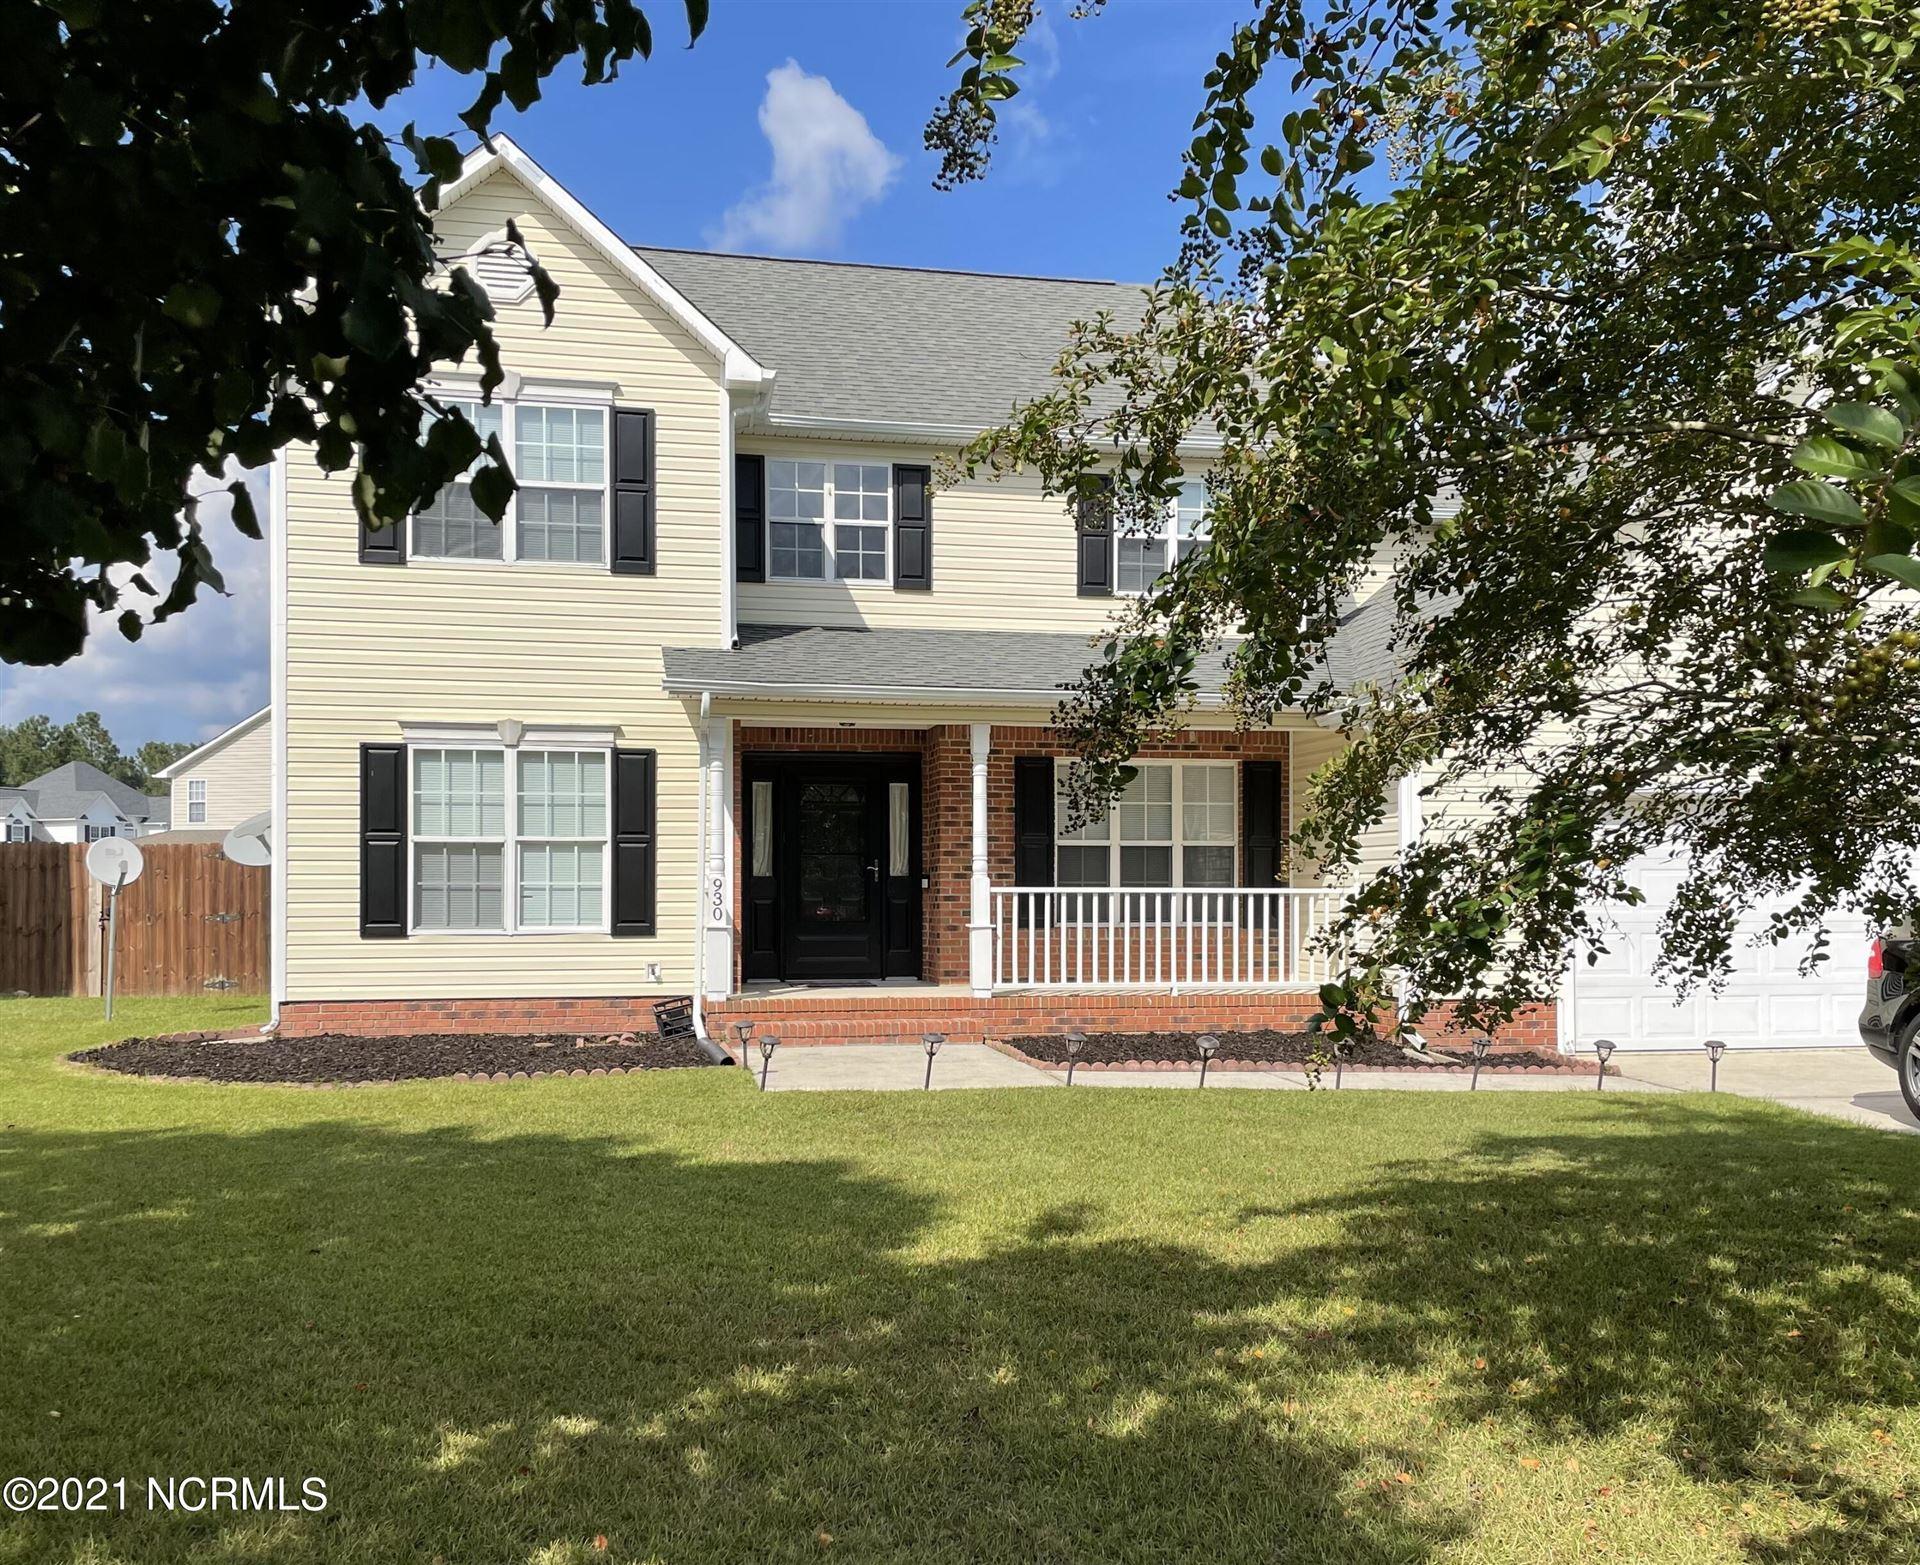 Photo of 930 Commons Drive N, Jacksonville, NC 28546 (MLS # 100293255)